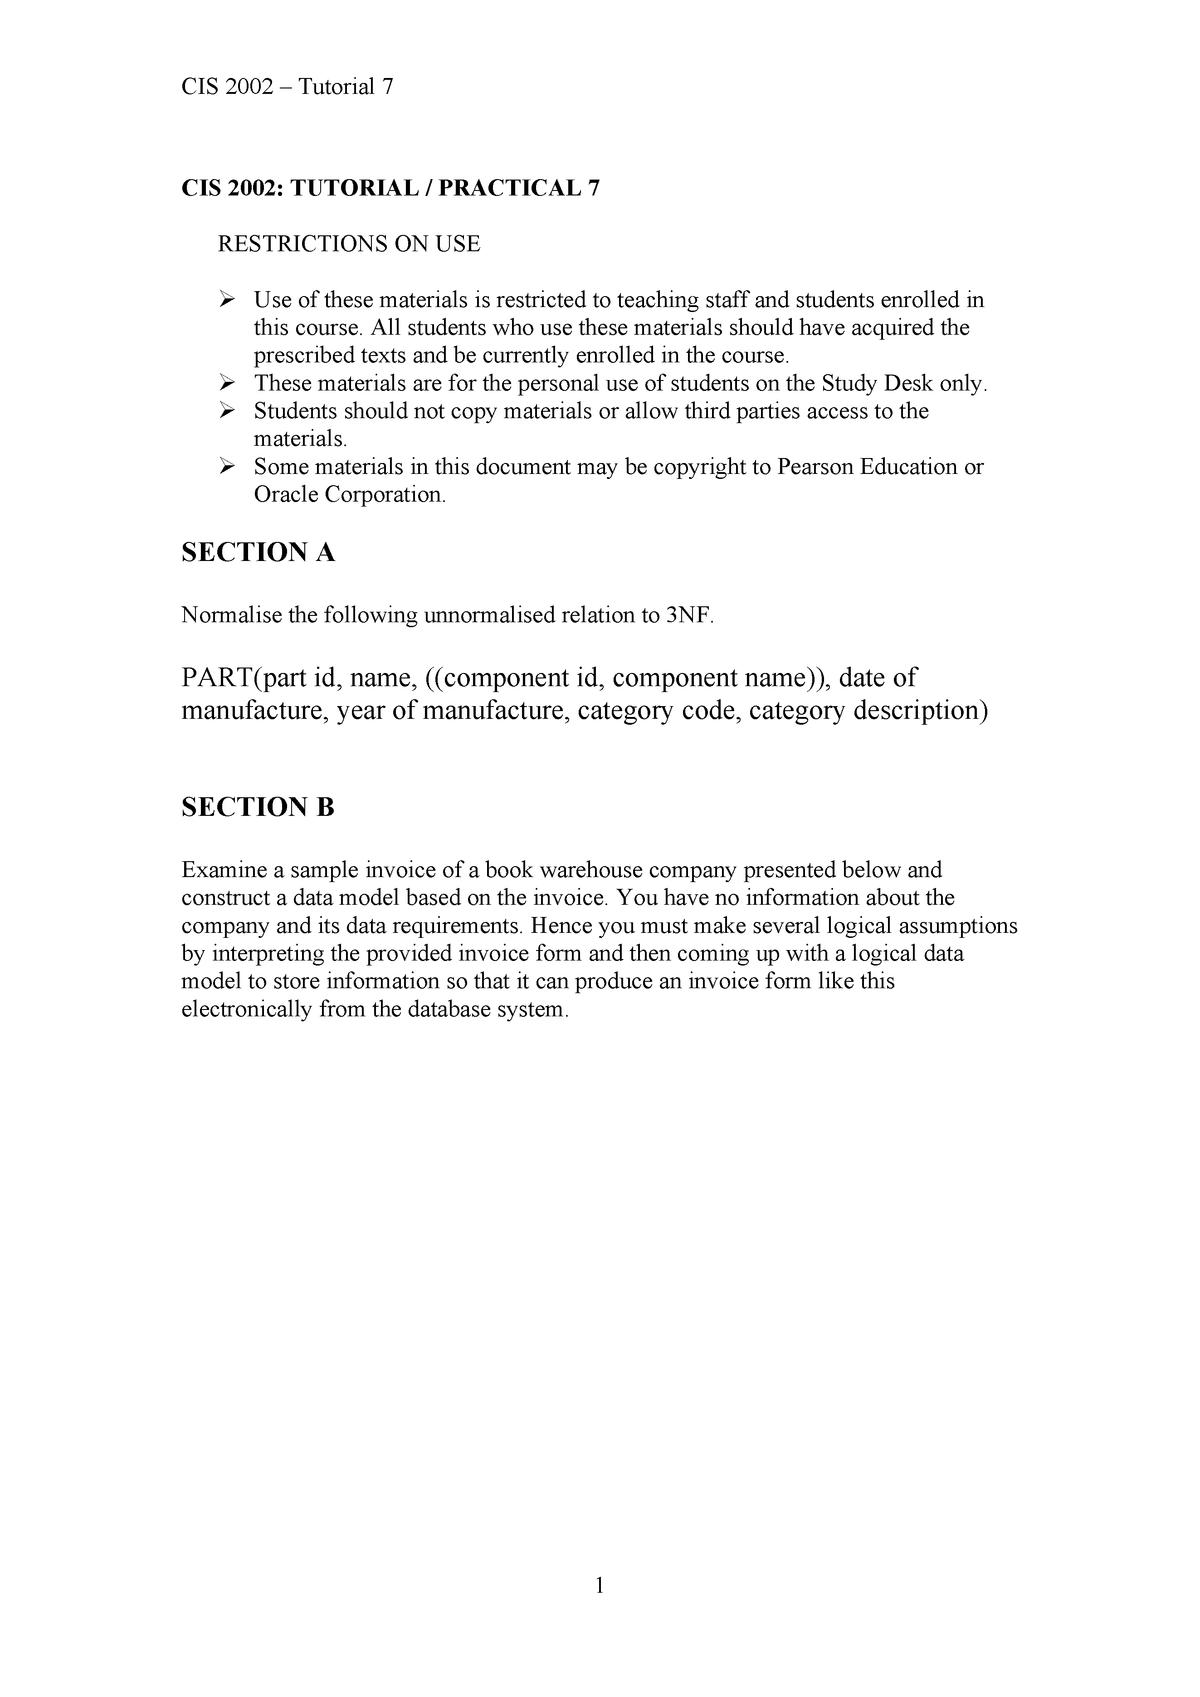 Tut7 v2 - Tutorial 7 - CIS2002: Database Design and Implementation